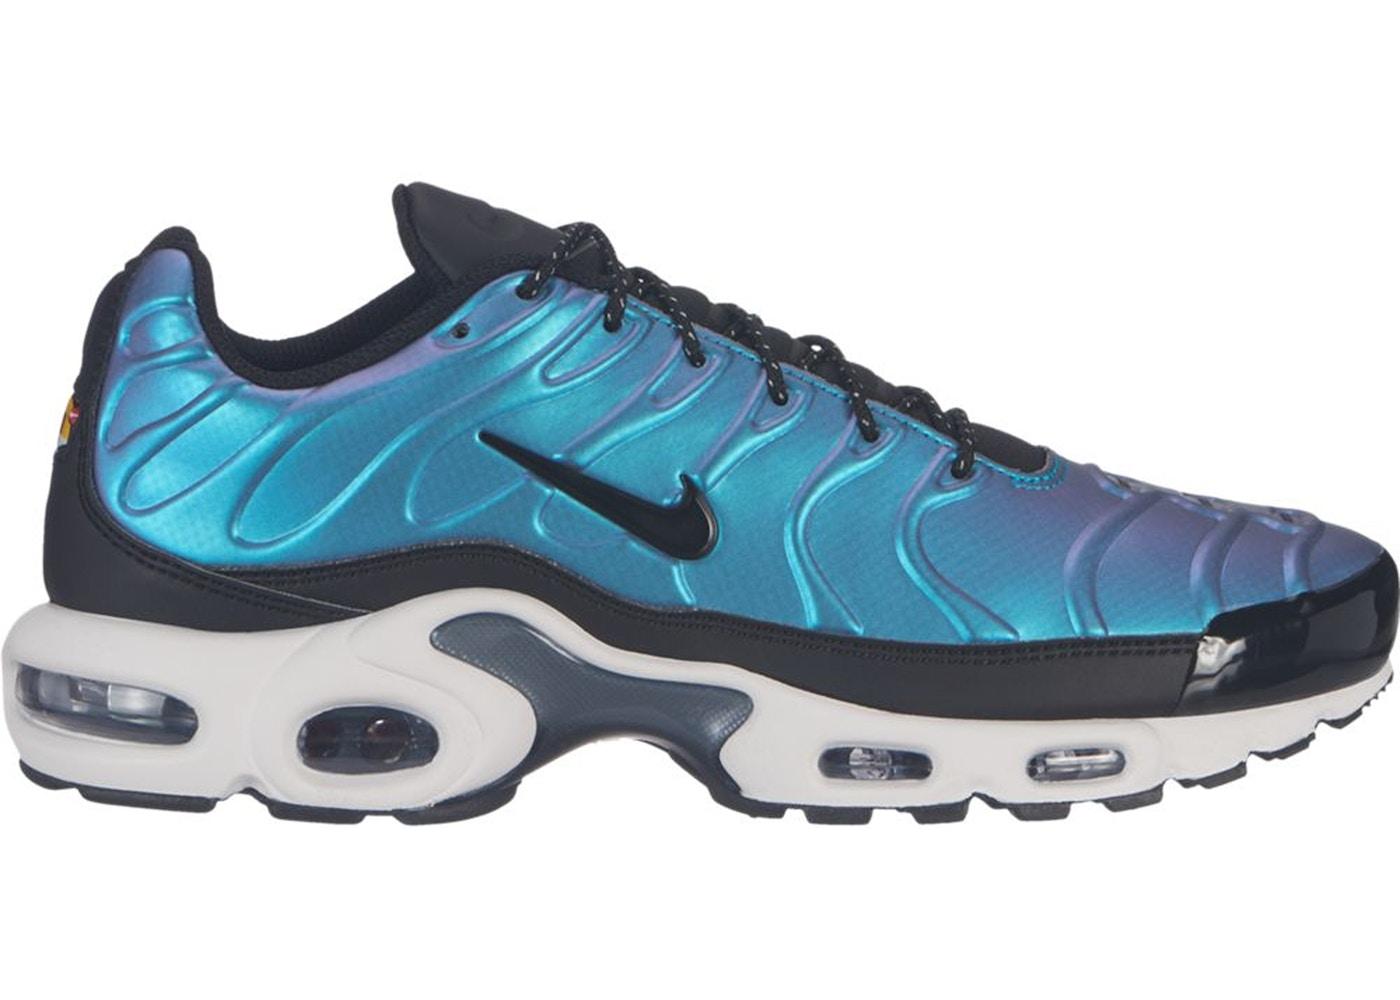 Nike Air Max Plus Liquid Metal Metallic Blue Dusk - AJ2013-401